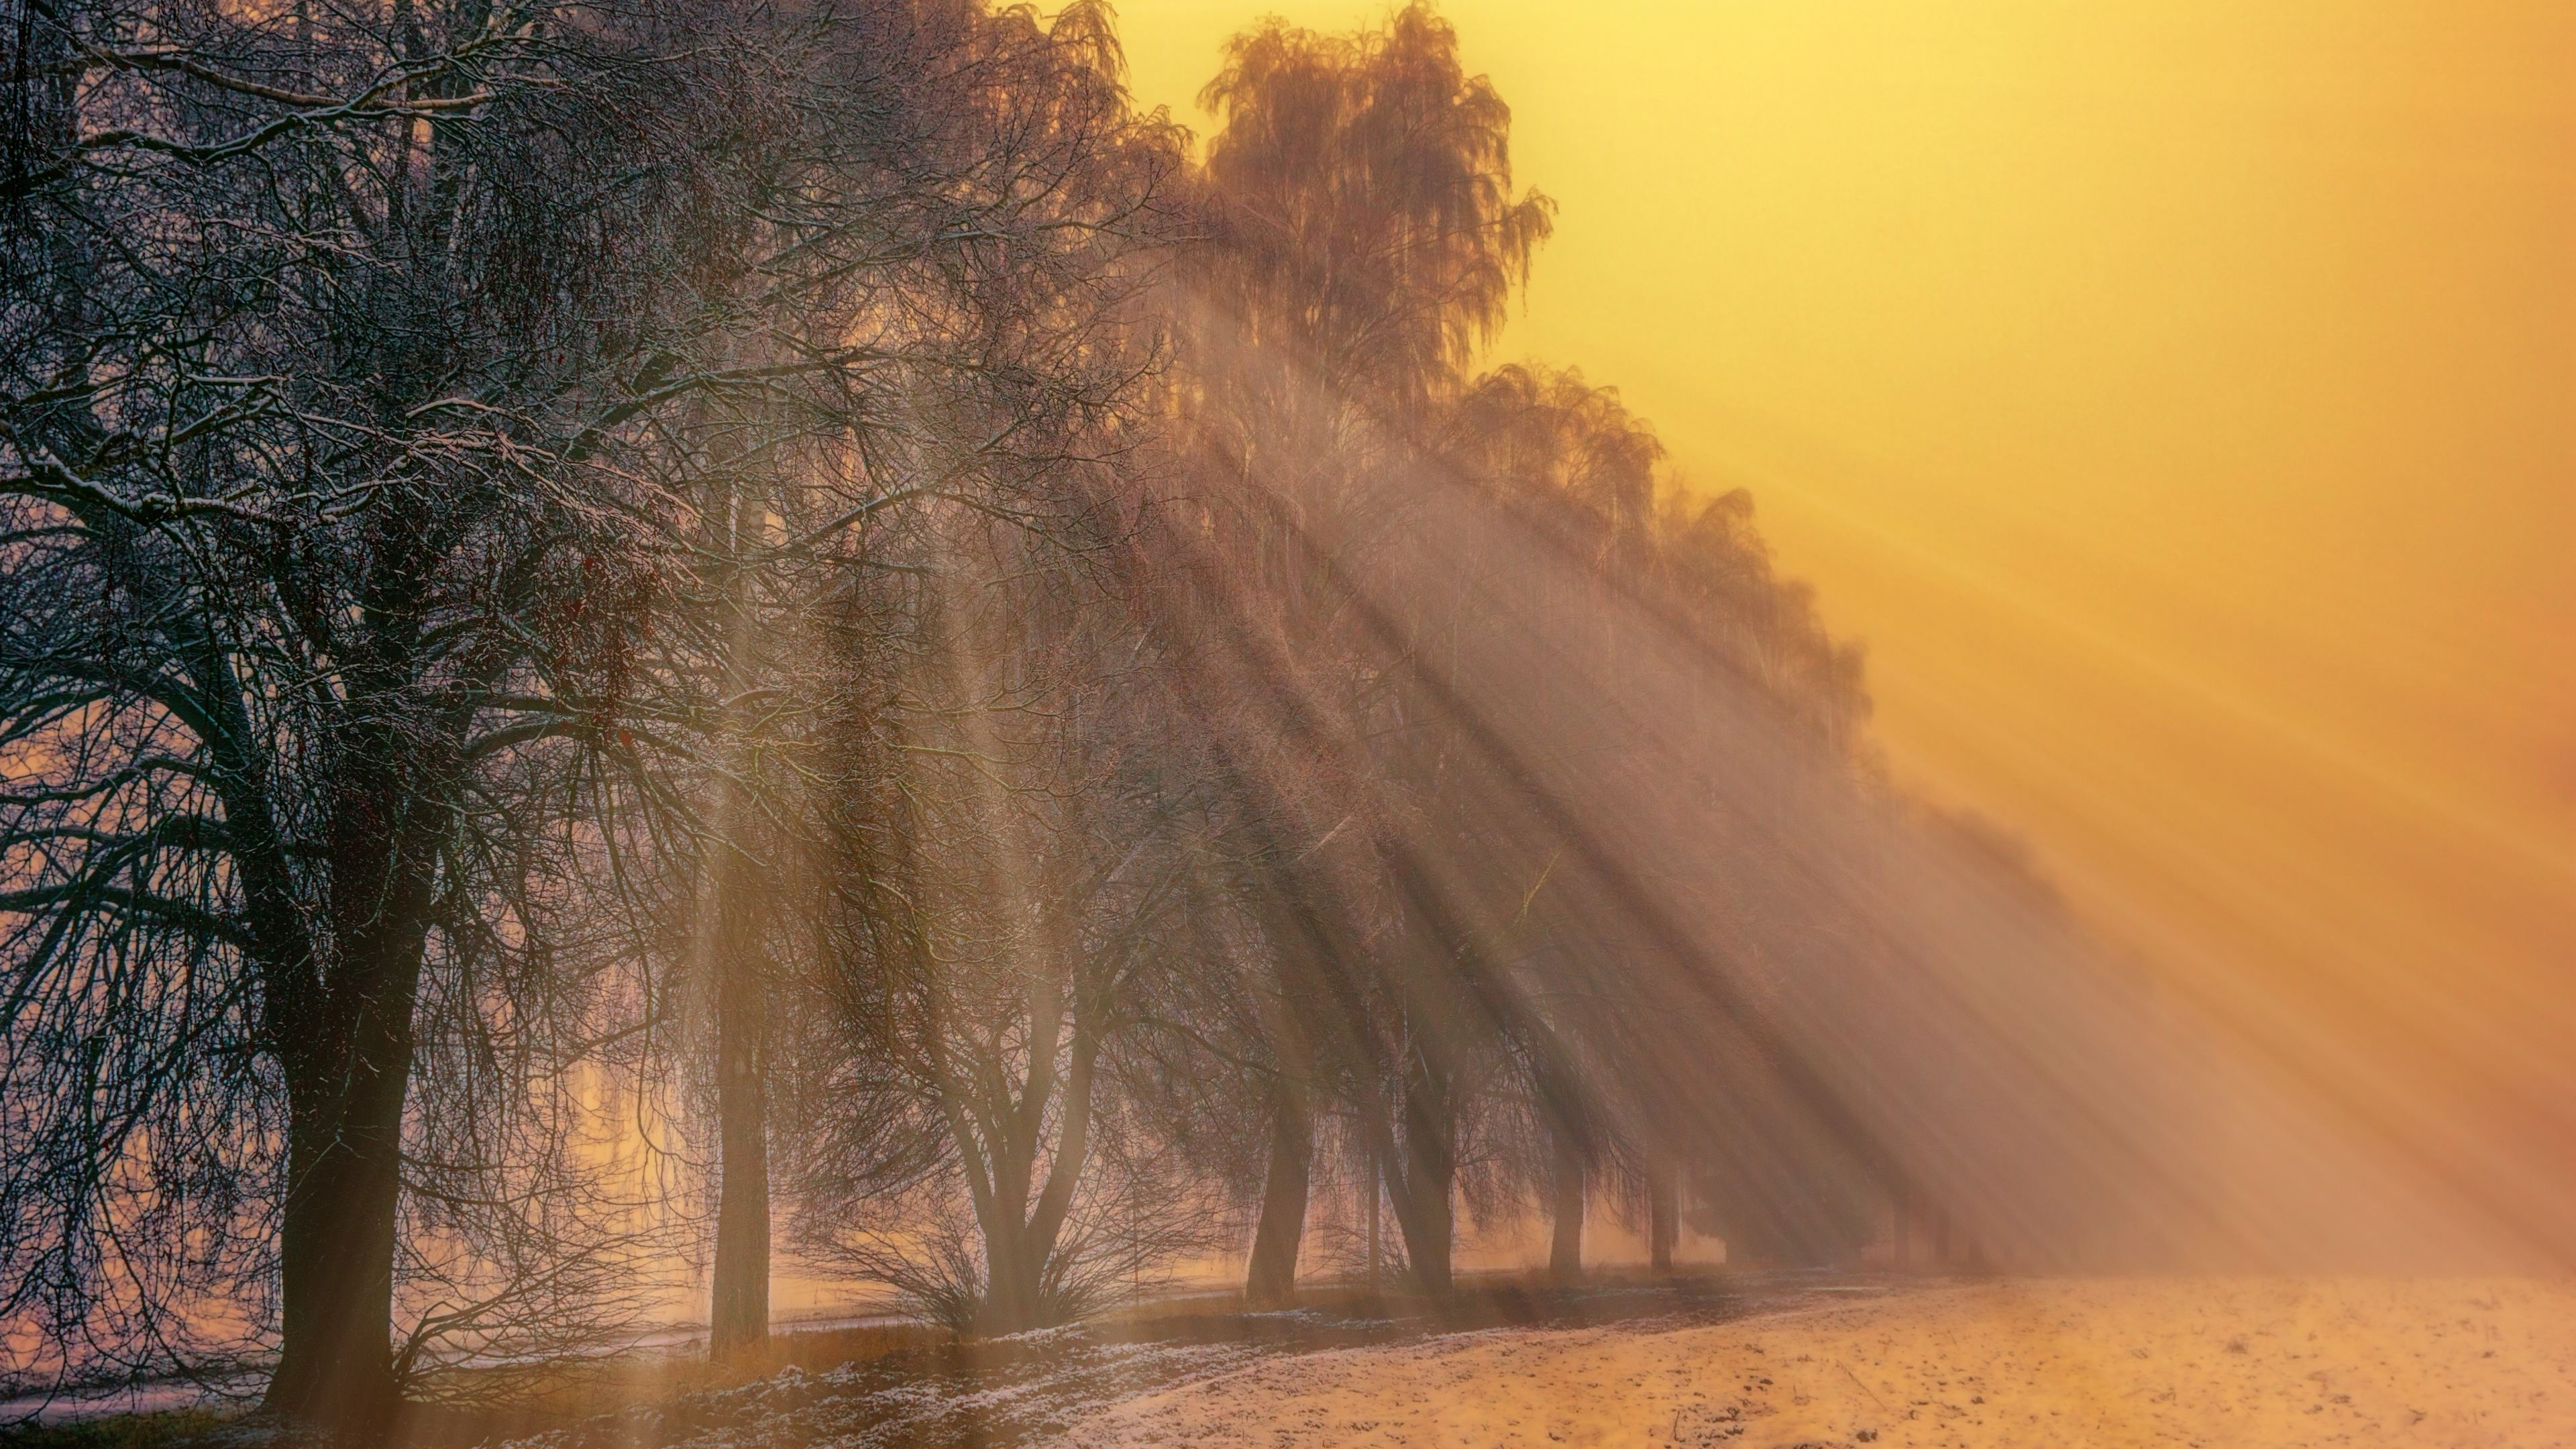 foggy trees winter 1540136553 - Foggy Trees Winter - winter wallpapers, trees wallpapers, nature wallpapers, hd-wallpapers, fog wallpapers, 4k-wallpapers